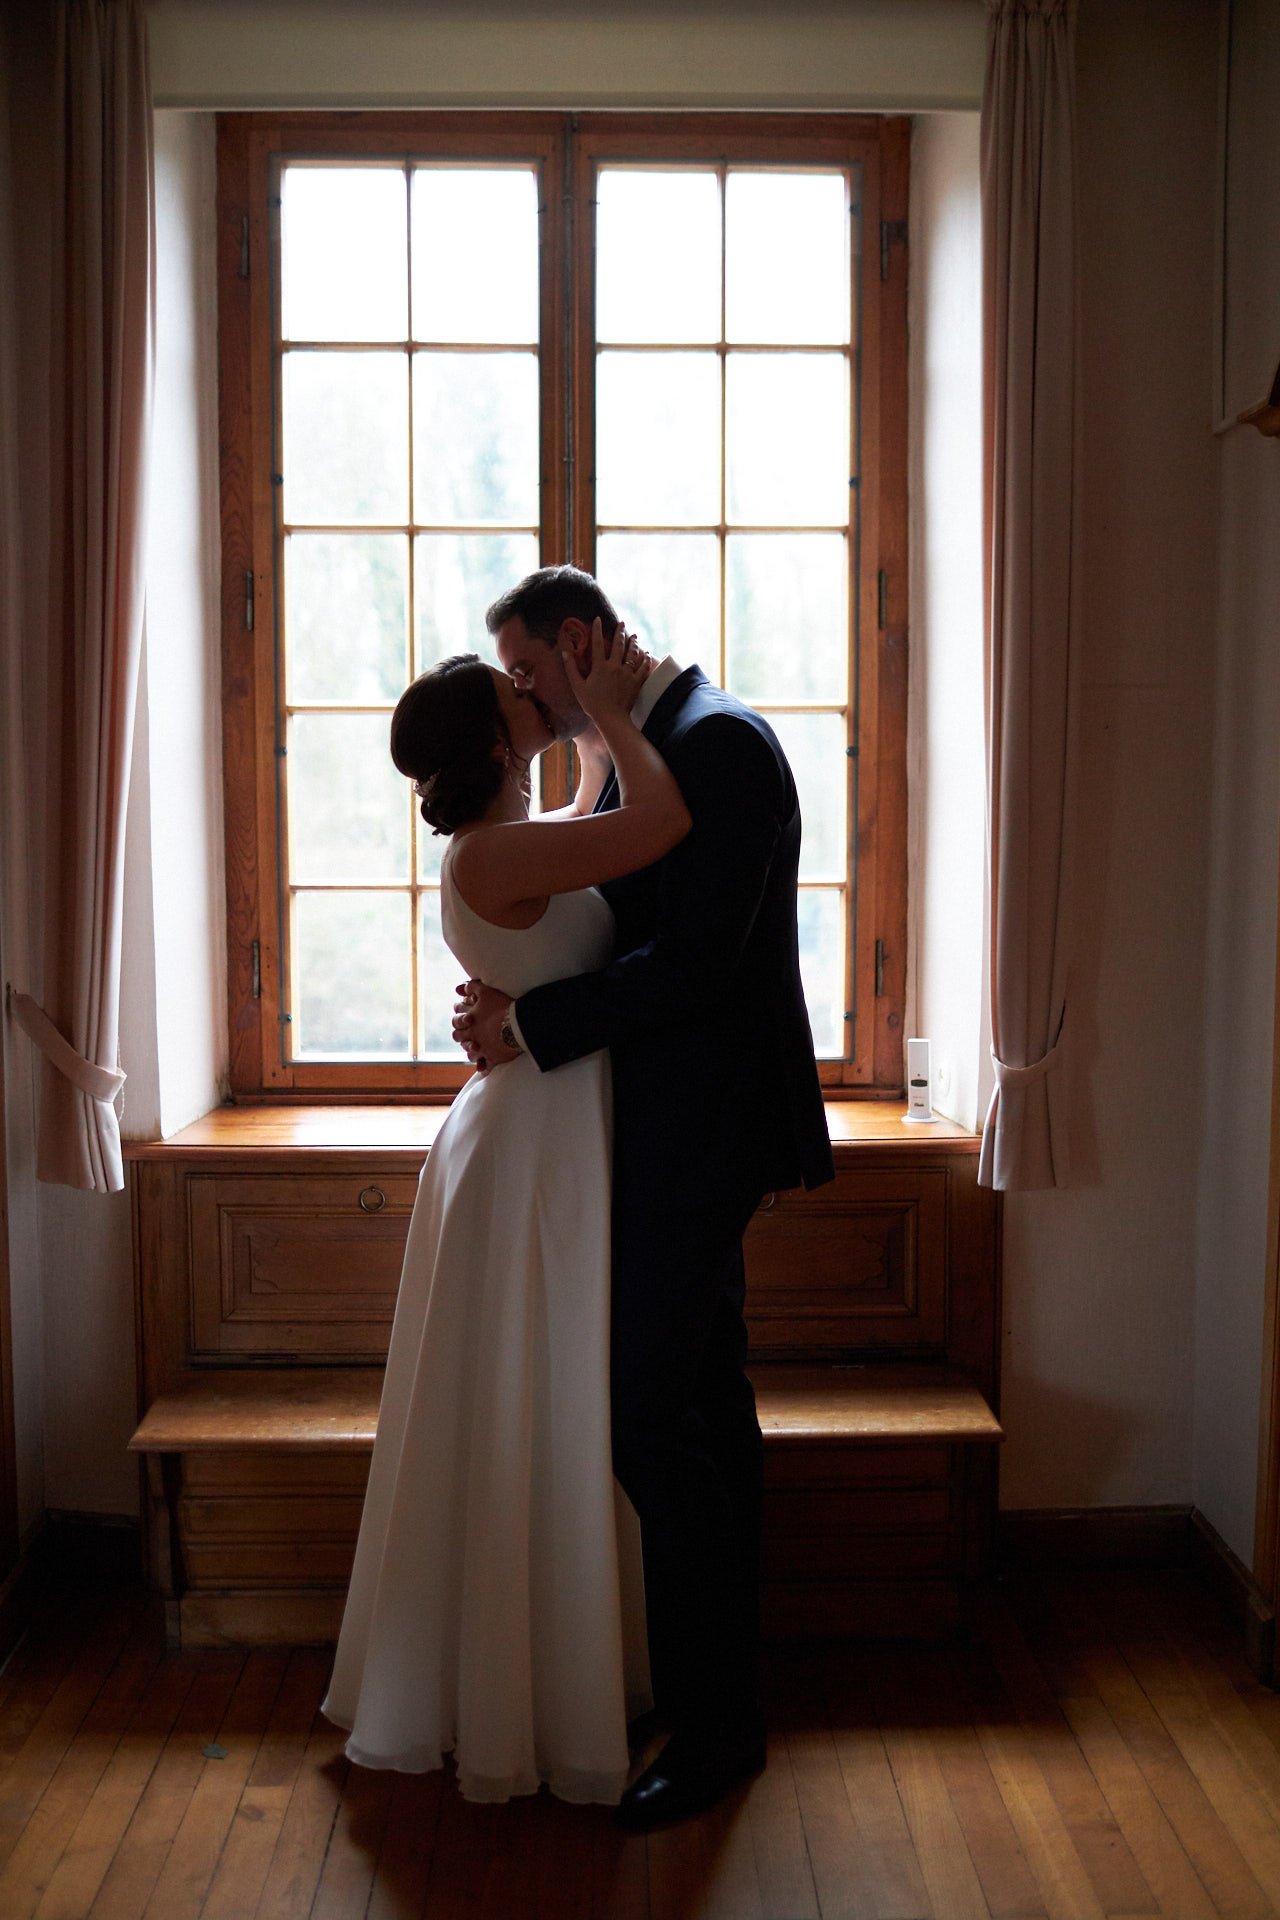 2019-12-20 Laura & Robin - Alena and Daniel Weddings 0222 1